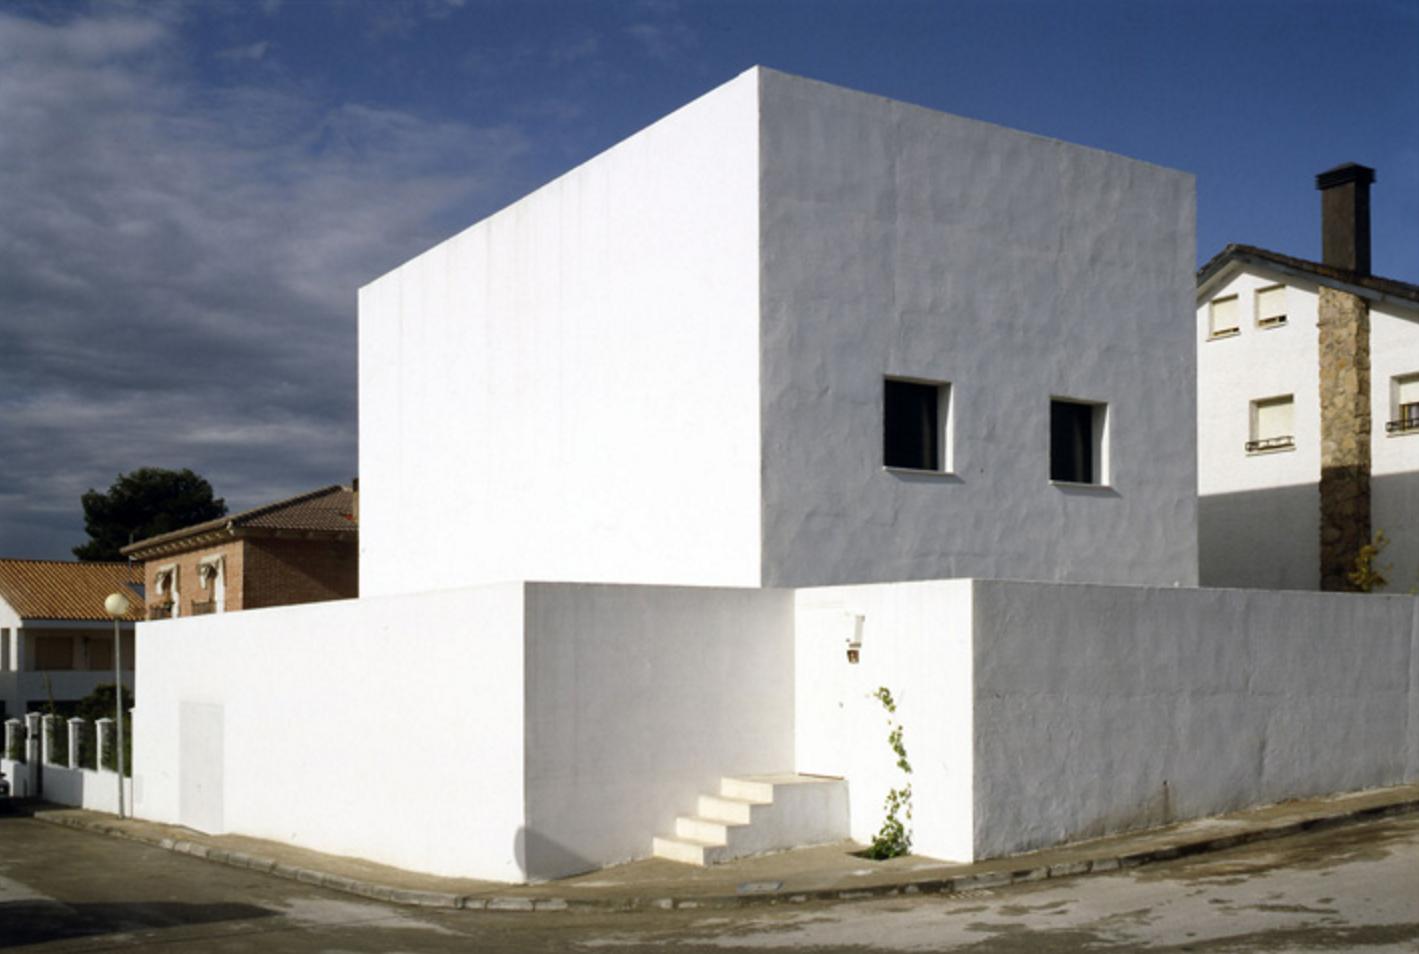 Domus aurea residence in mexico by alberto campo baeza bvs 169 - Garcia Marcos House By Alberto Campo Baeza